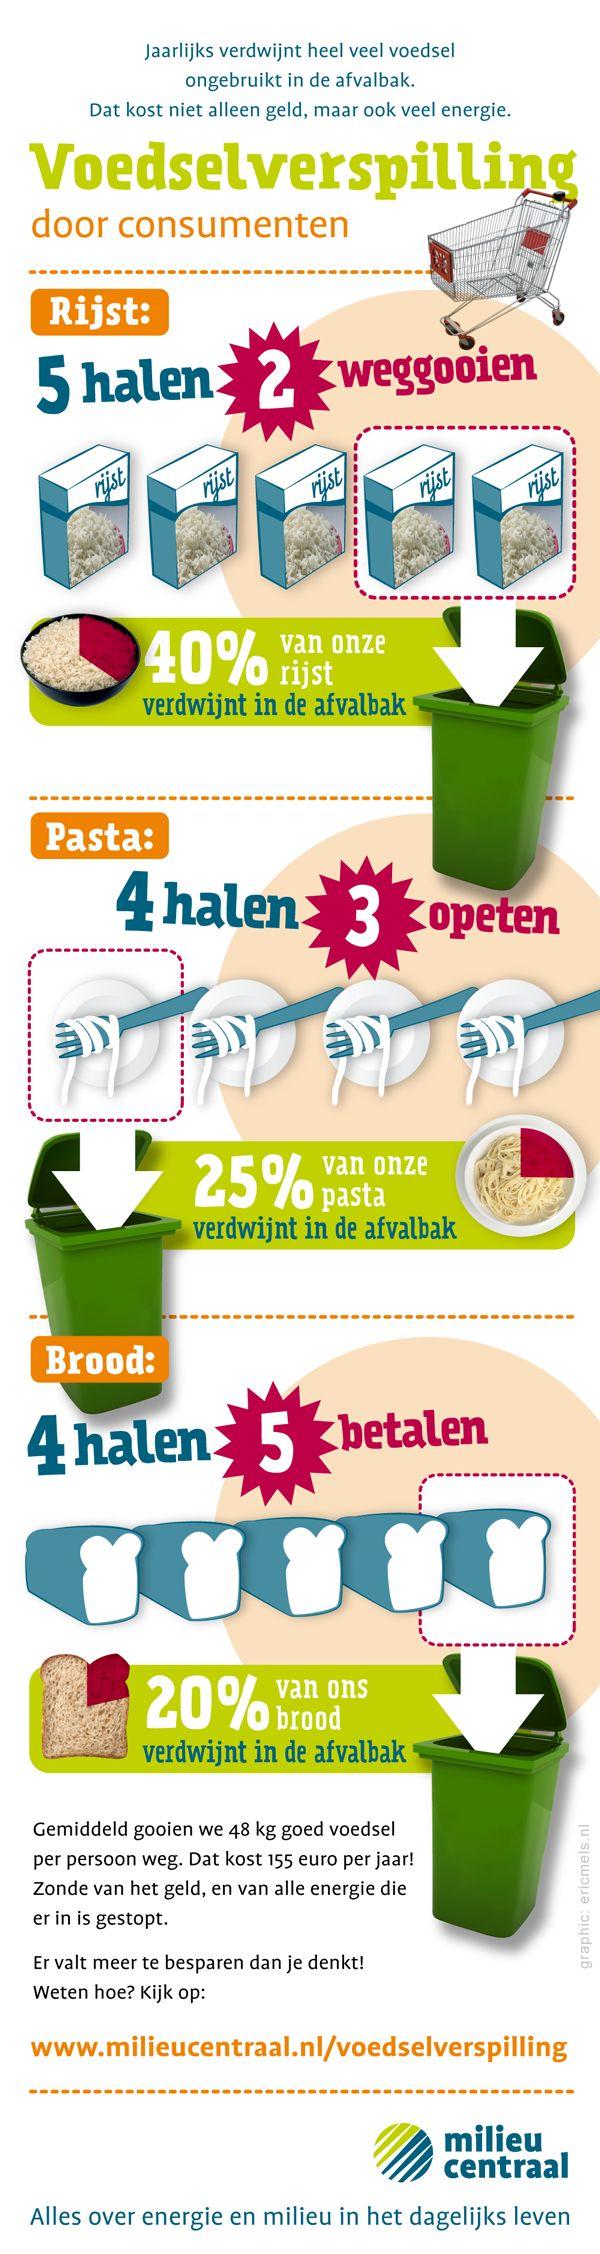 ericmels.nl - infovisuals